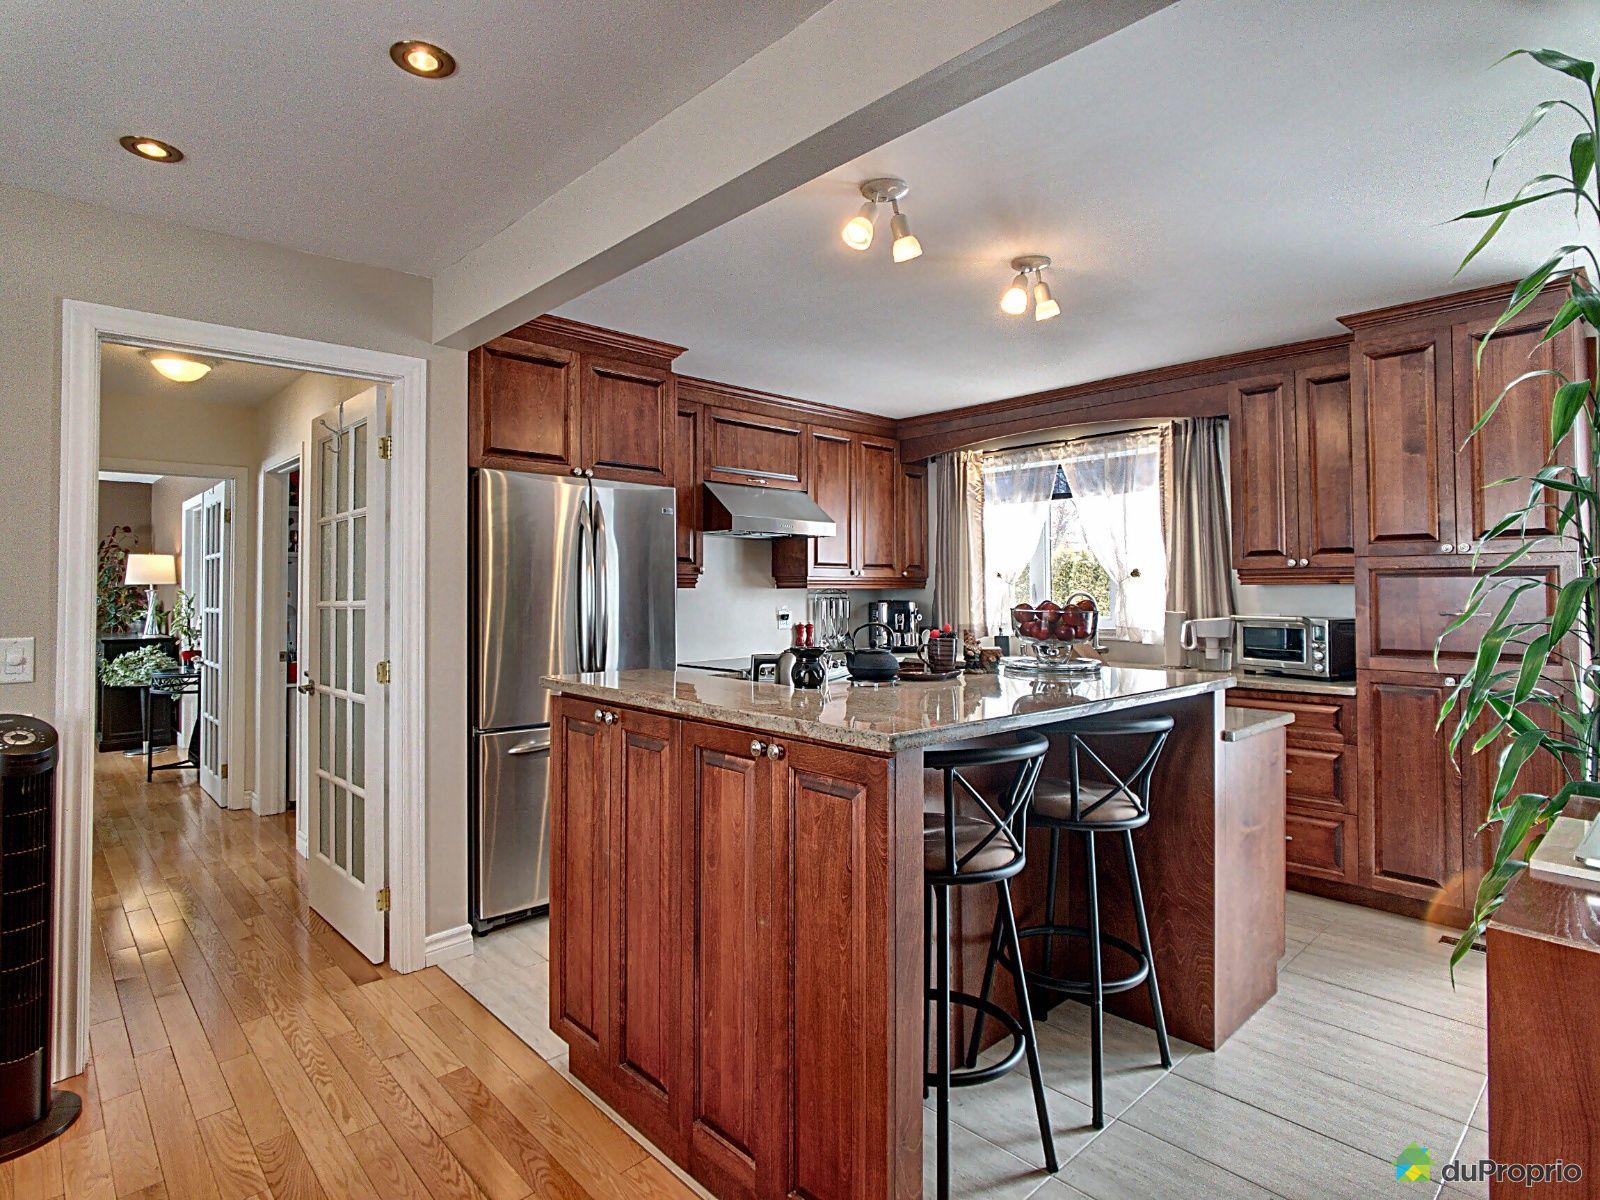 Kitchen - 3402 avenue des Platanes, Charlesbourg for sale